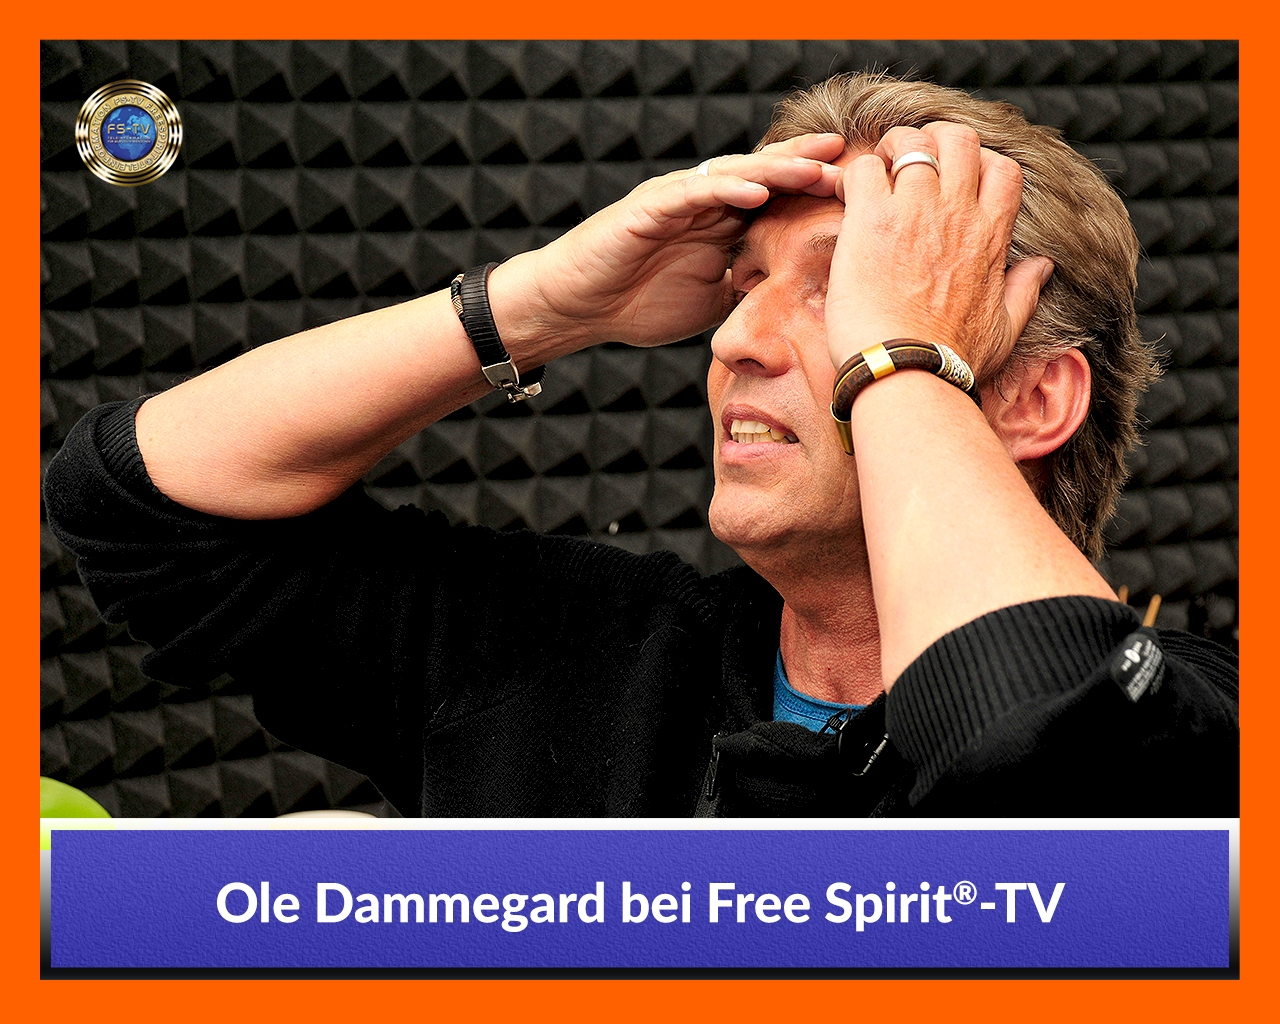 Galleriebild-Ole-Dammegard-2